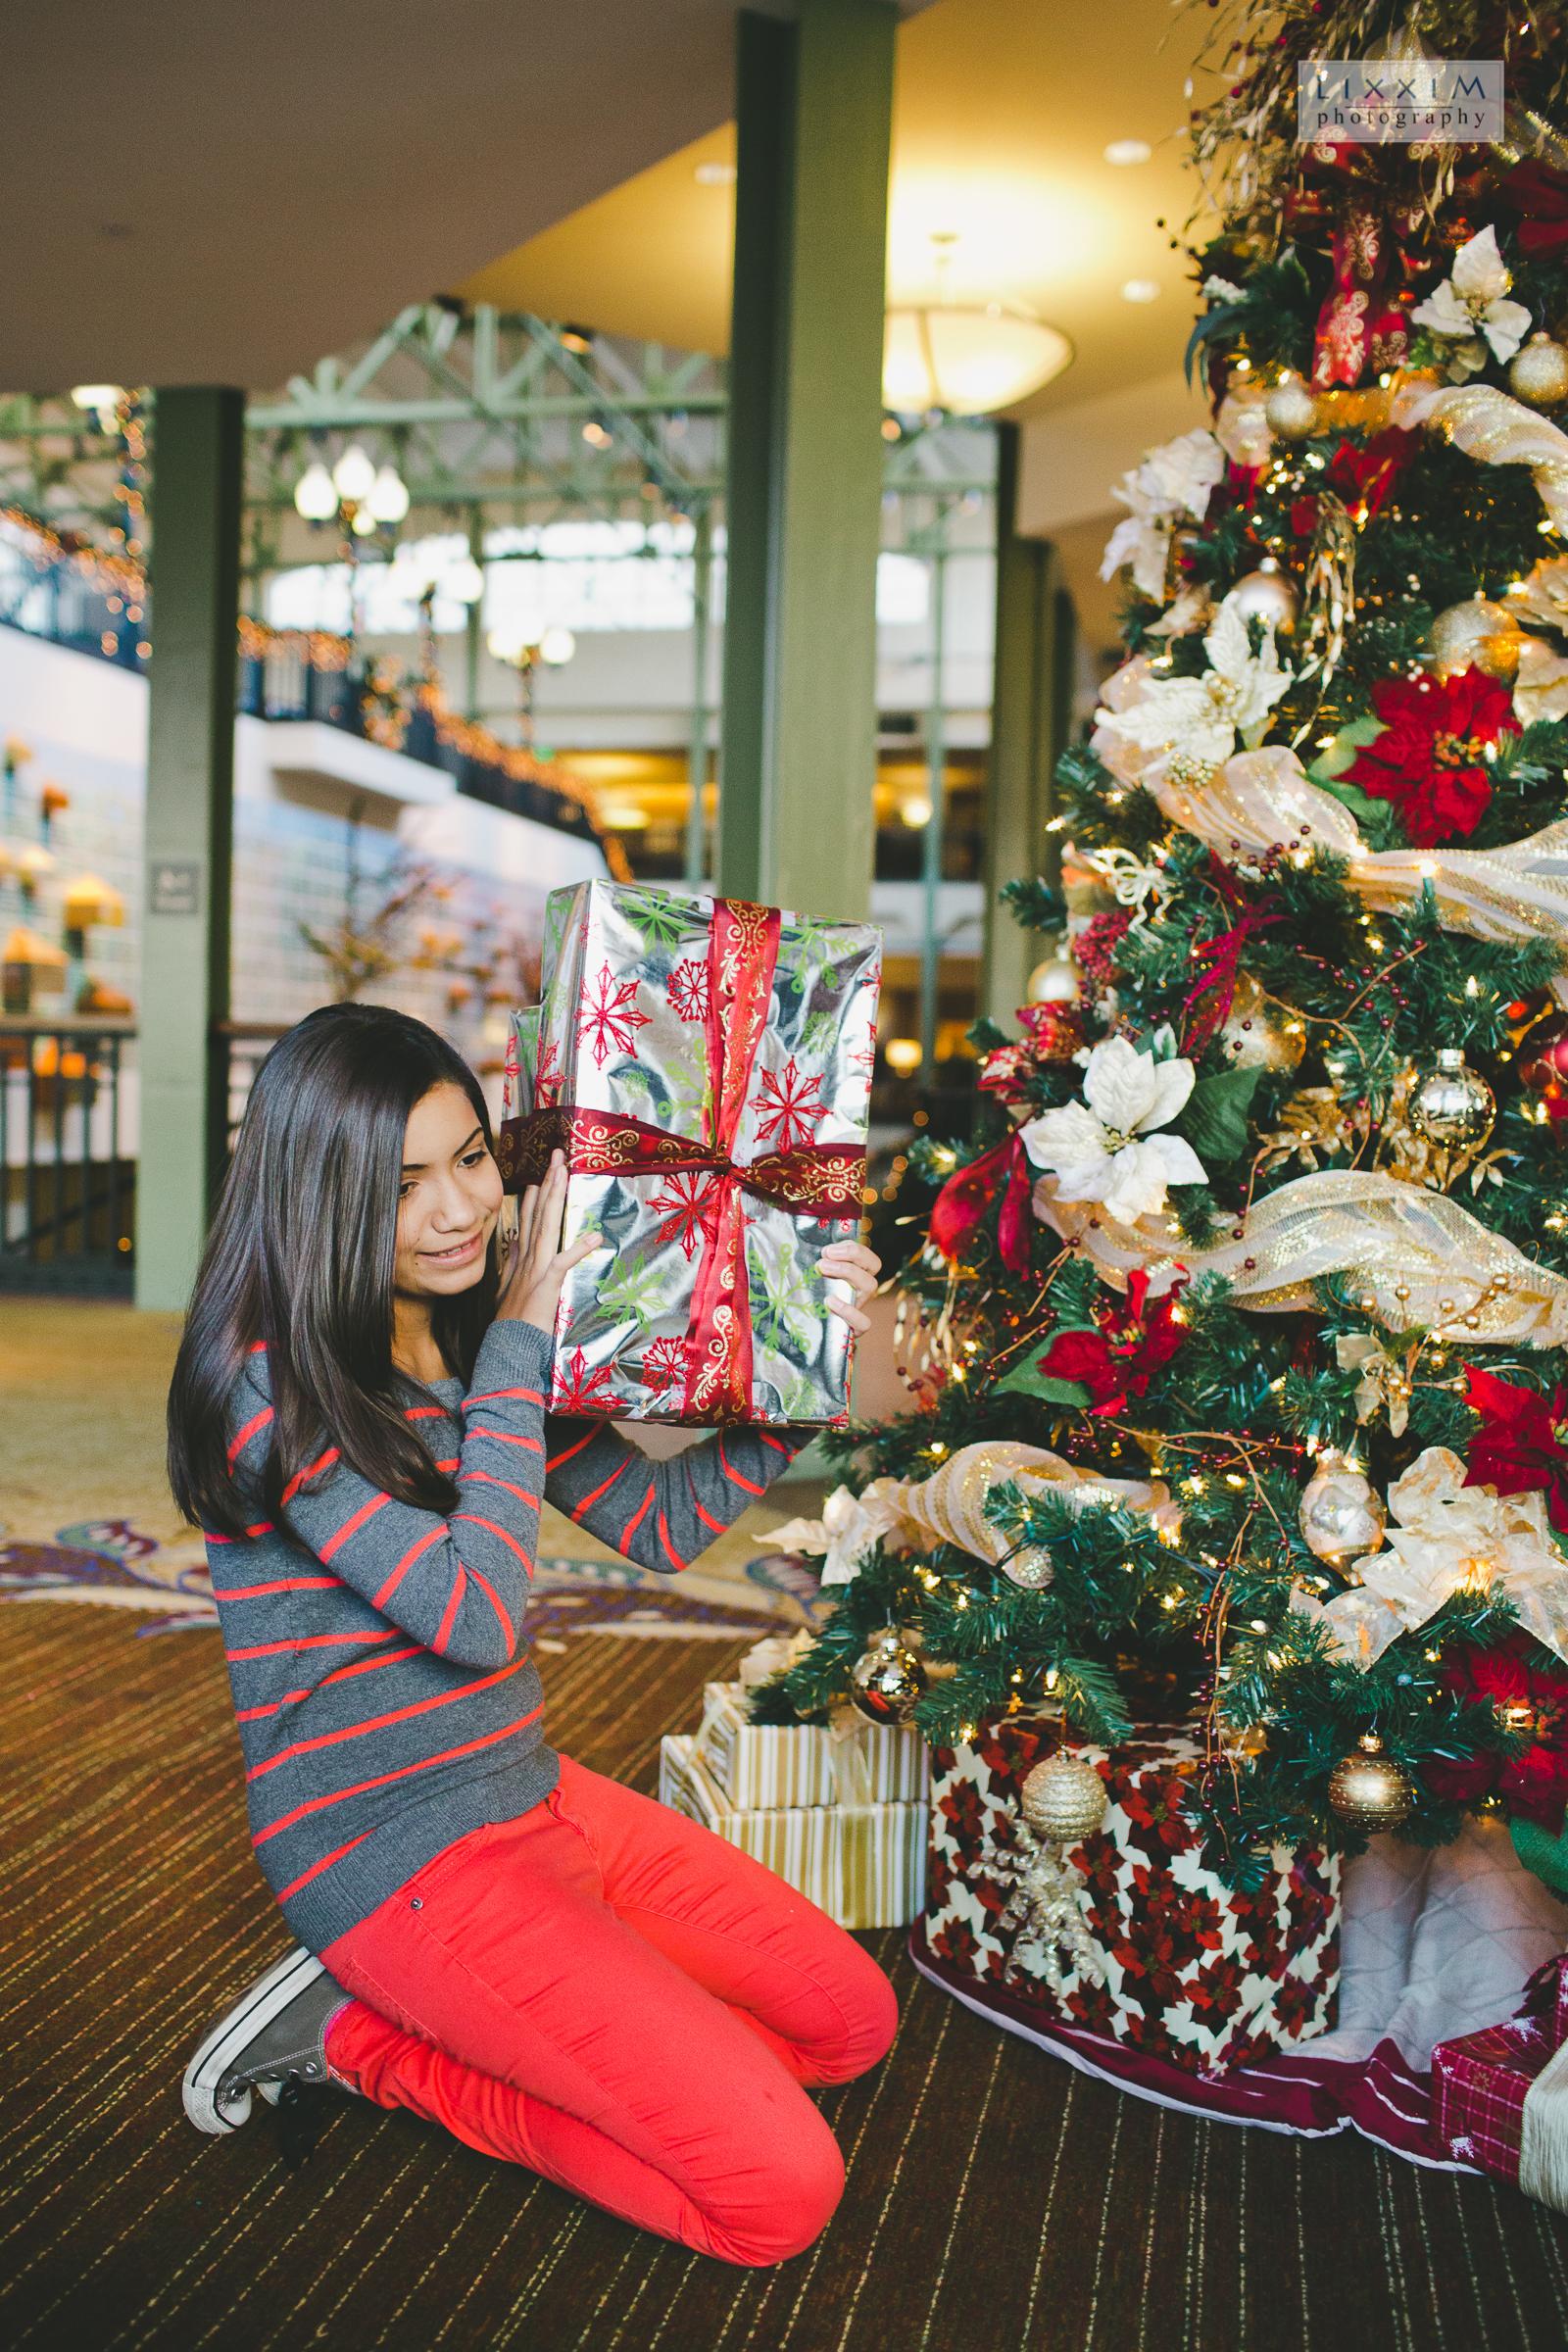 girl-opening-christmas-presents-tree-happy-morning-joy.jpg